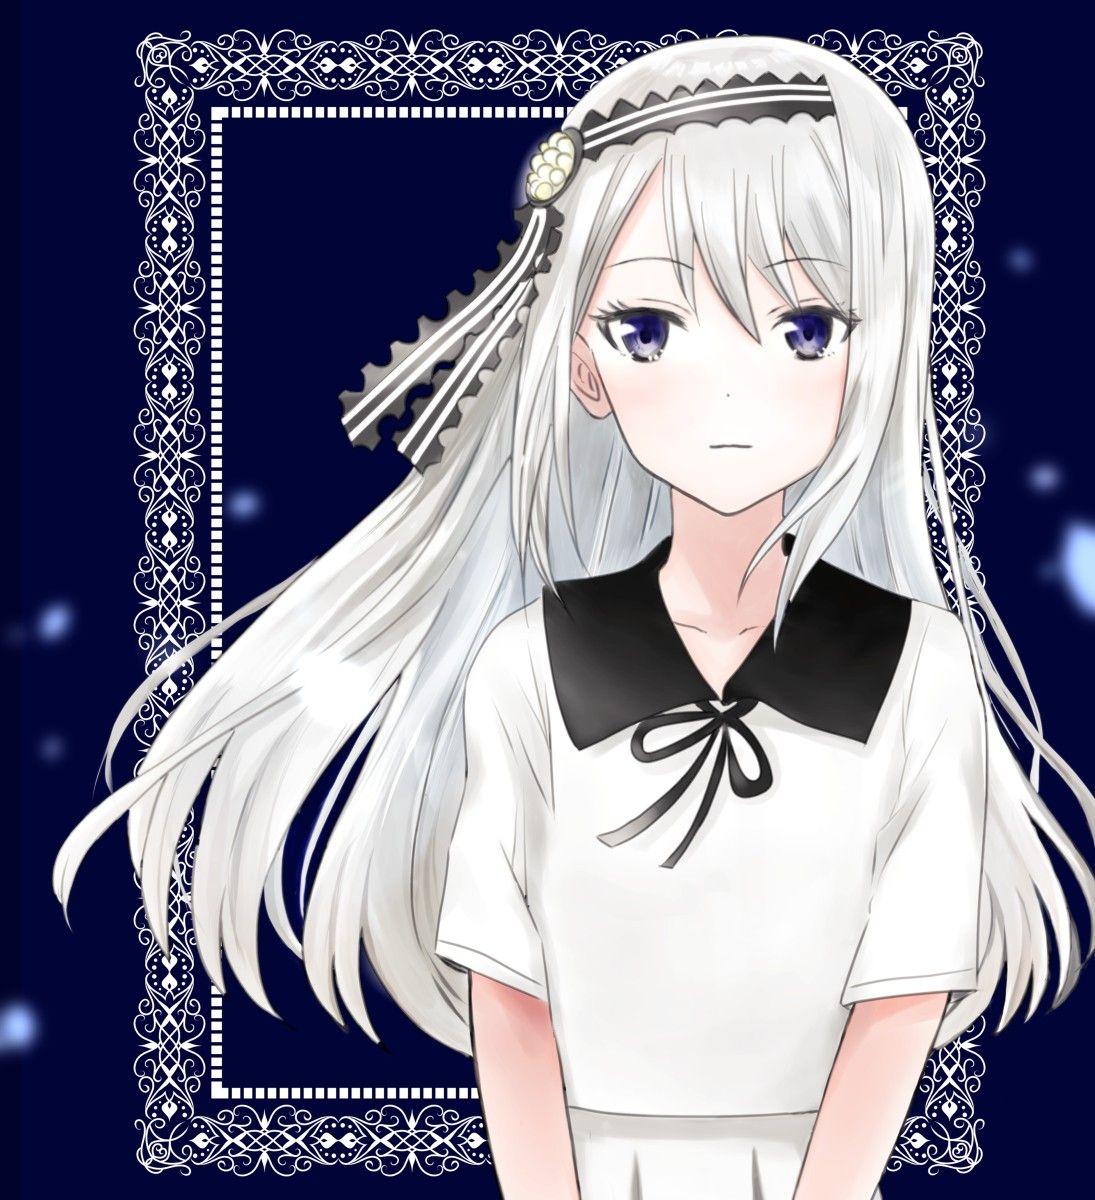 Kaguya Anime 2019: Kaguya-sama Wa Kokurasetai Em 2019